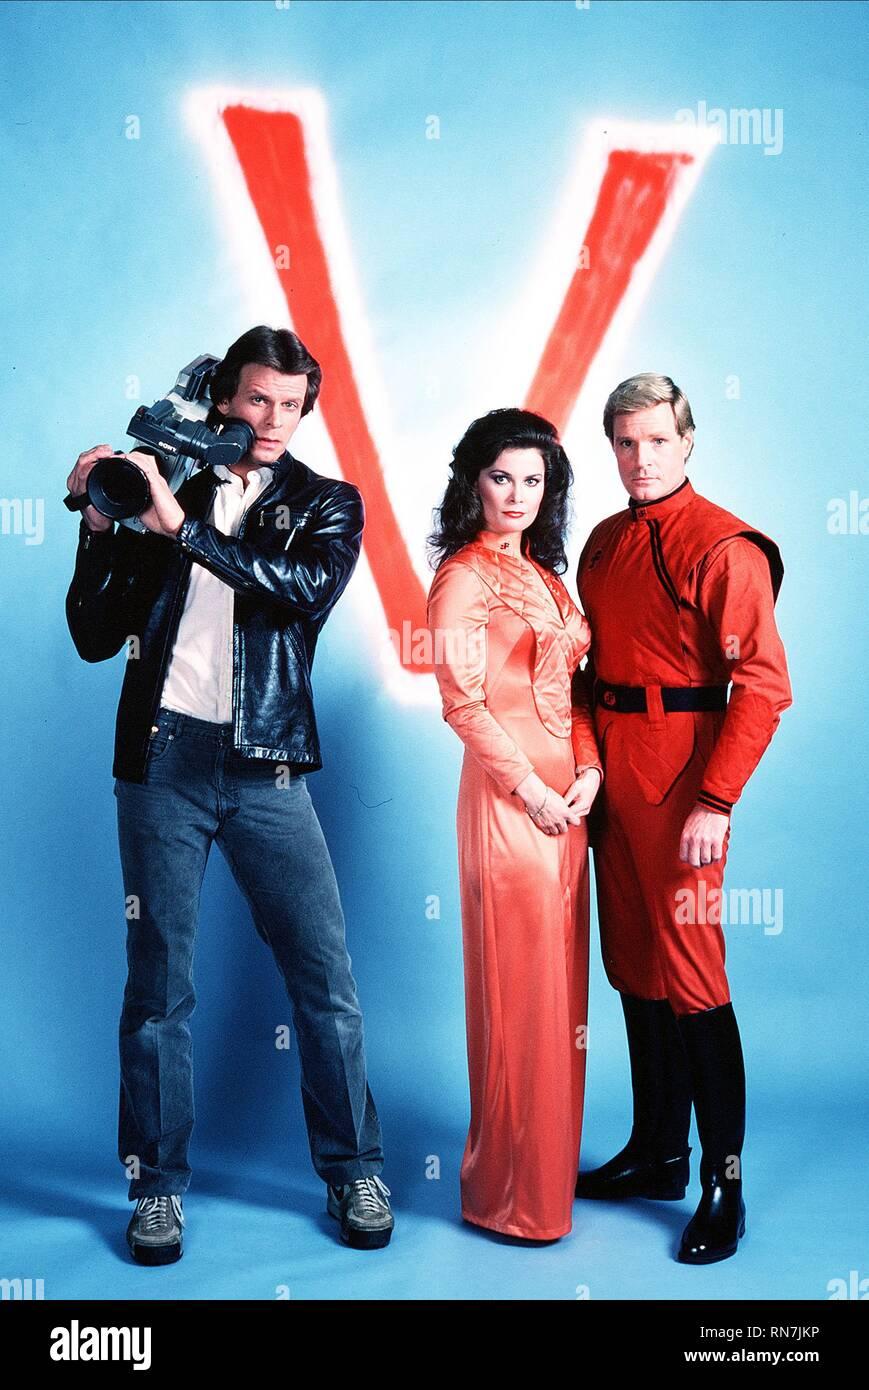 V Tv Series Jane Badler Stock Photos & V Tv Series Jane Badler Stock